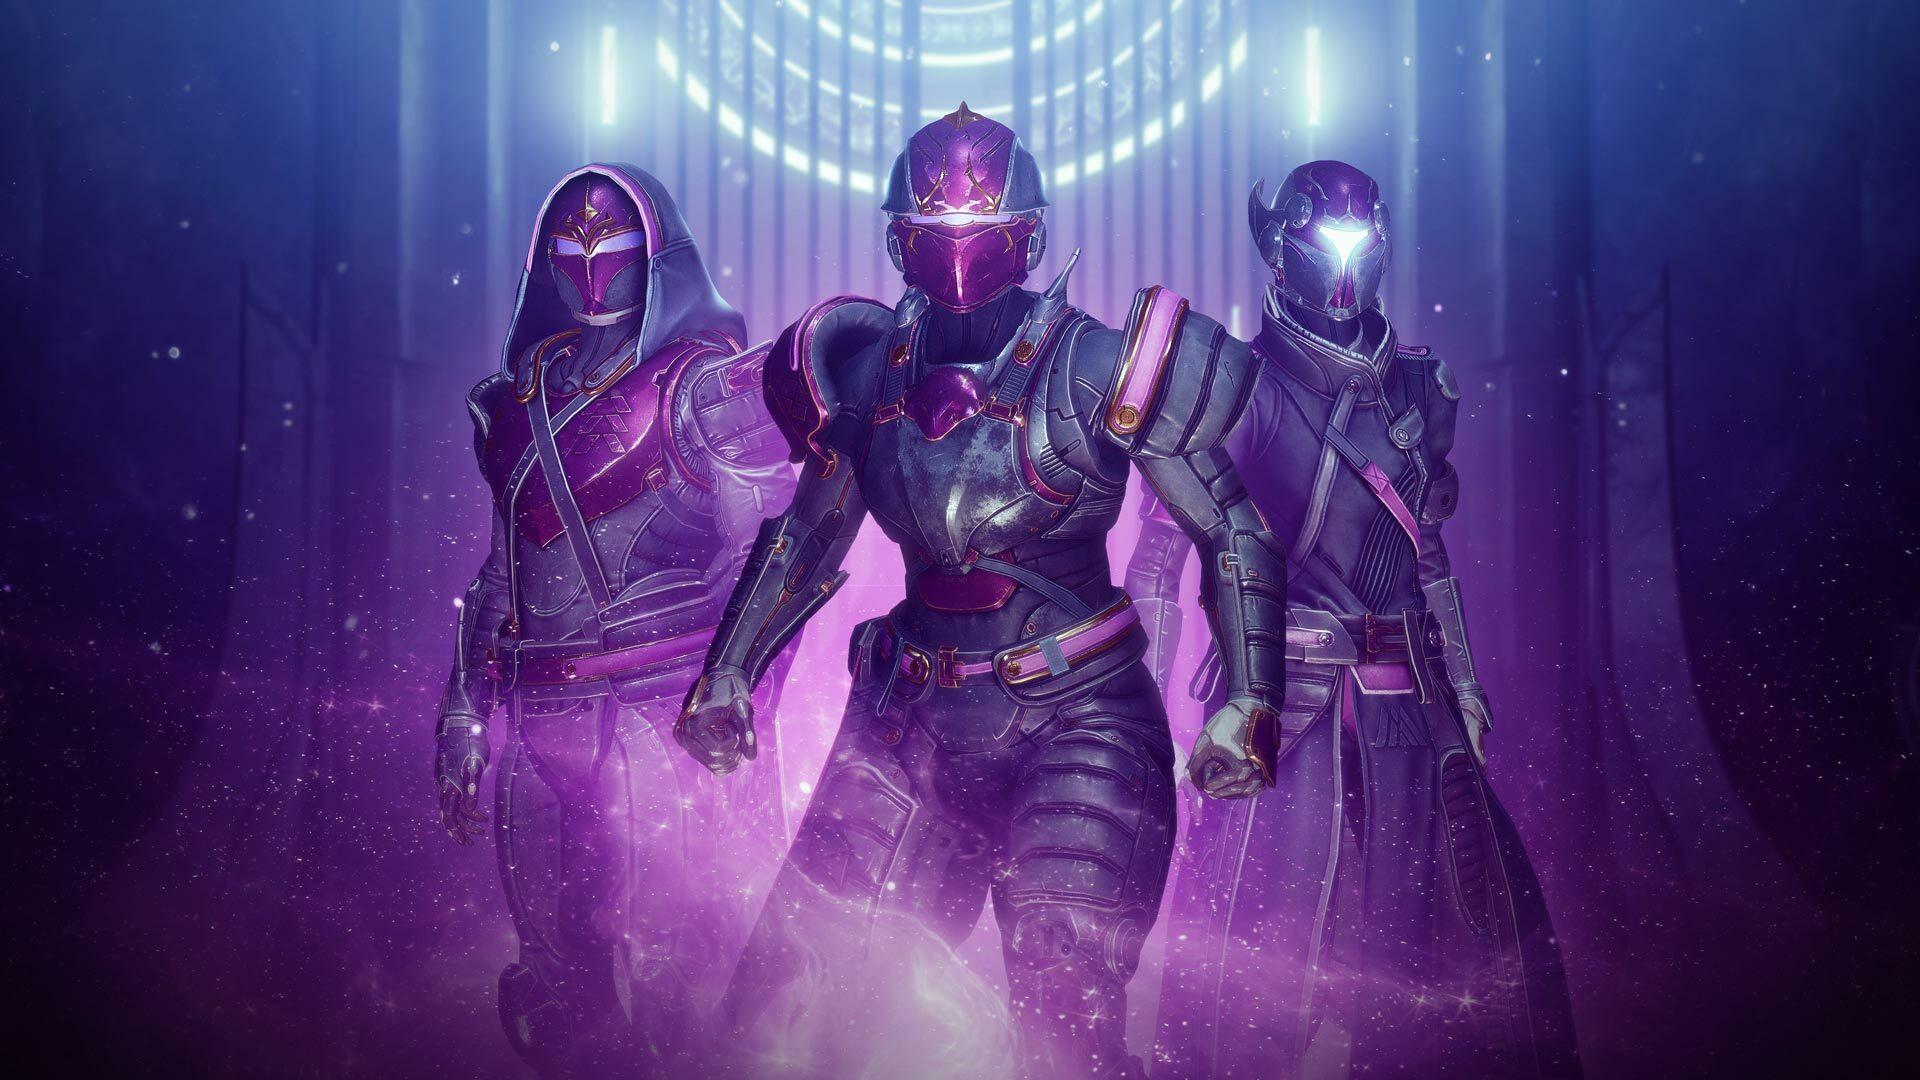 Destiny 2 update 3.3.0.3